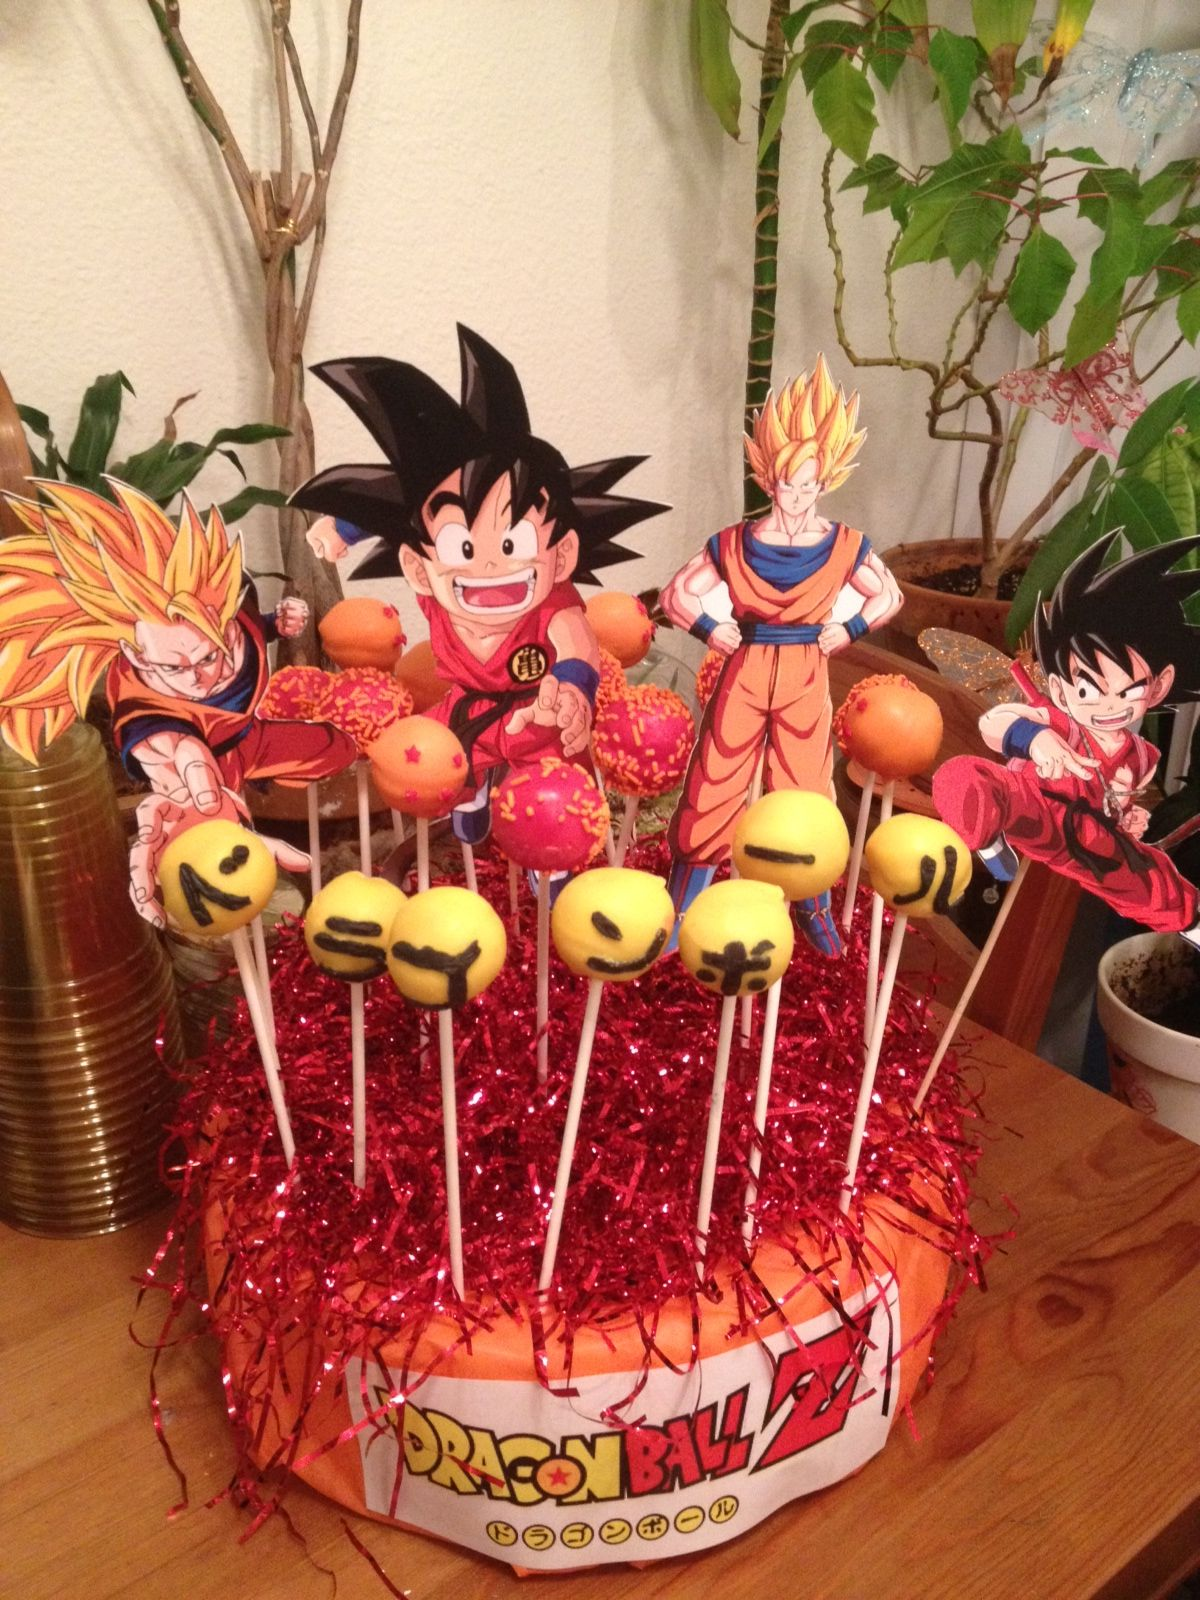 Dragon Ball Z Cake Pops